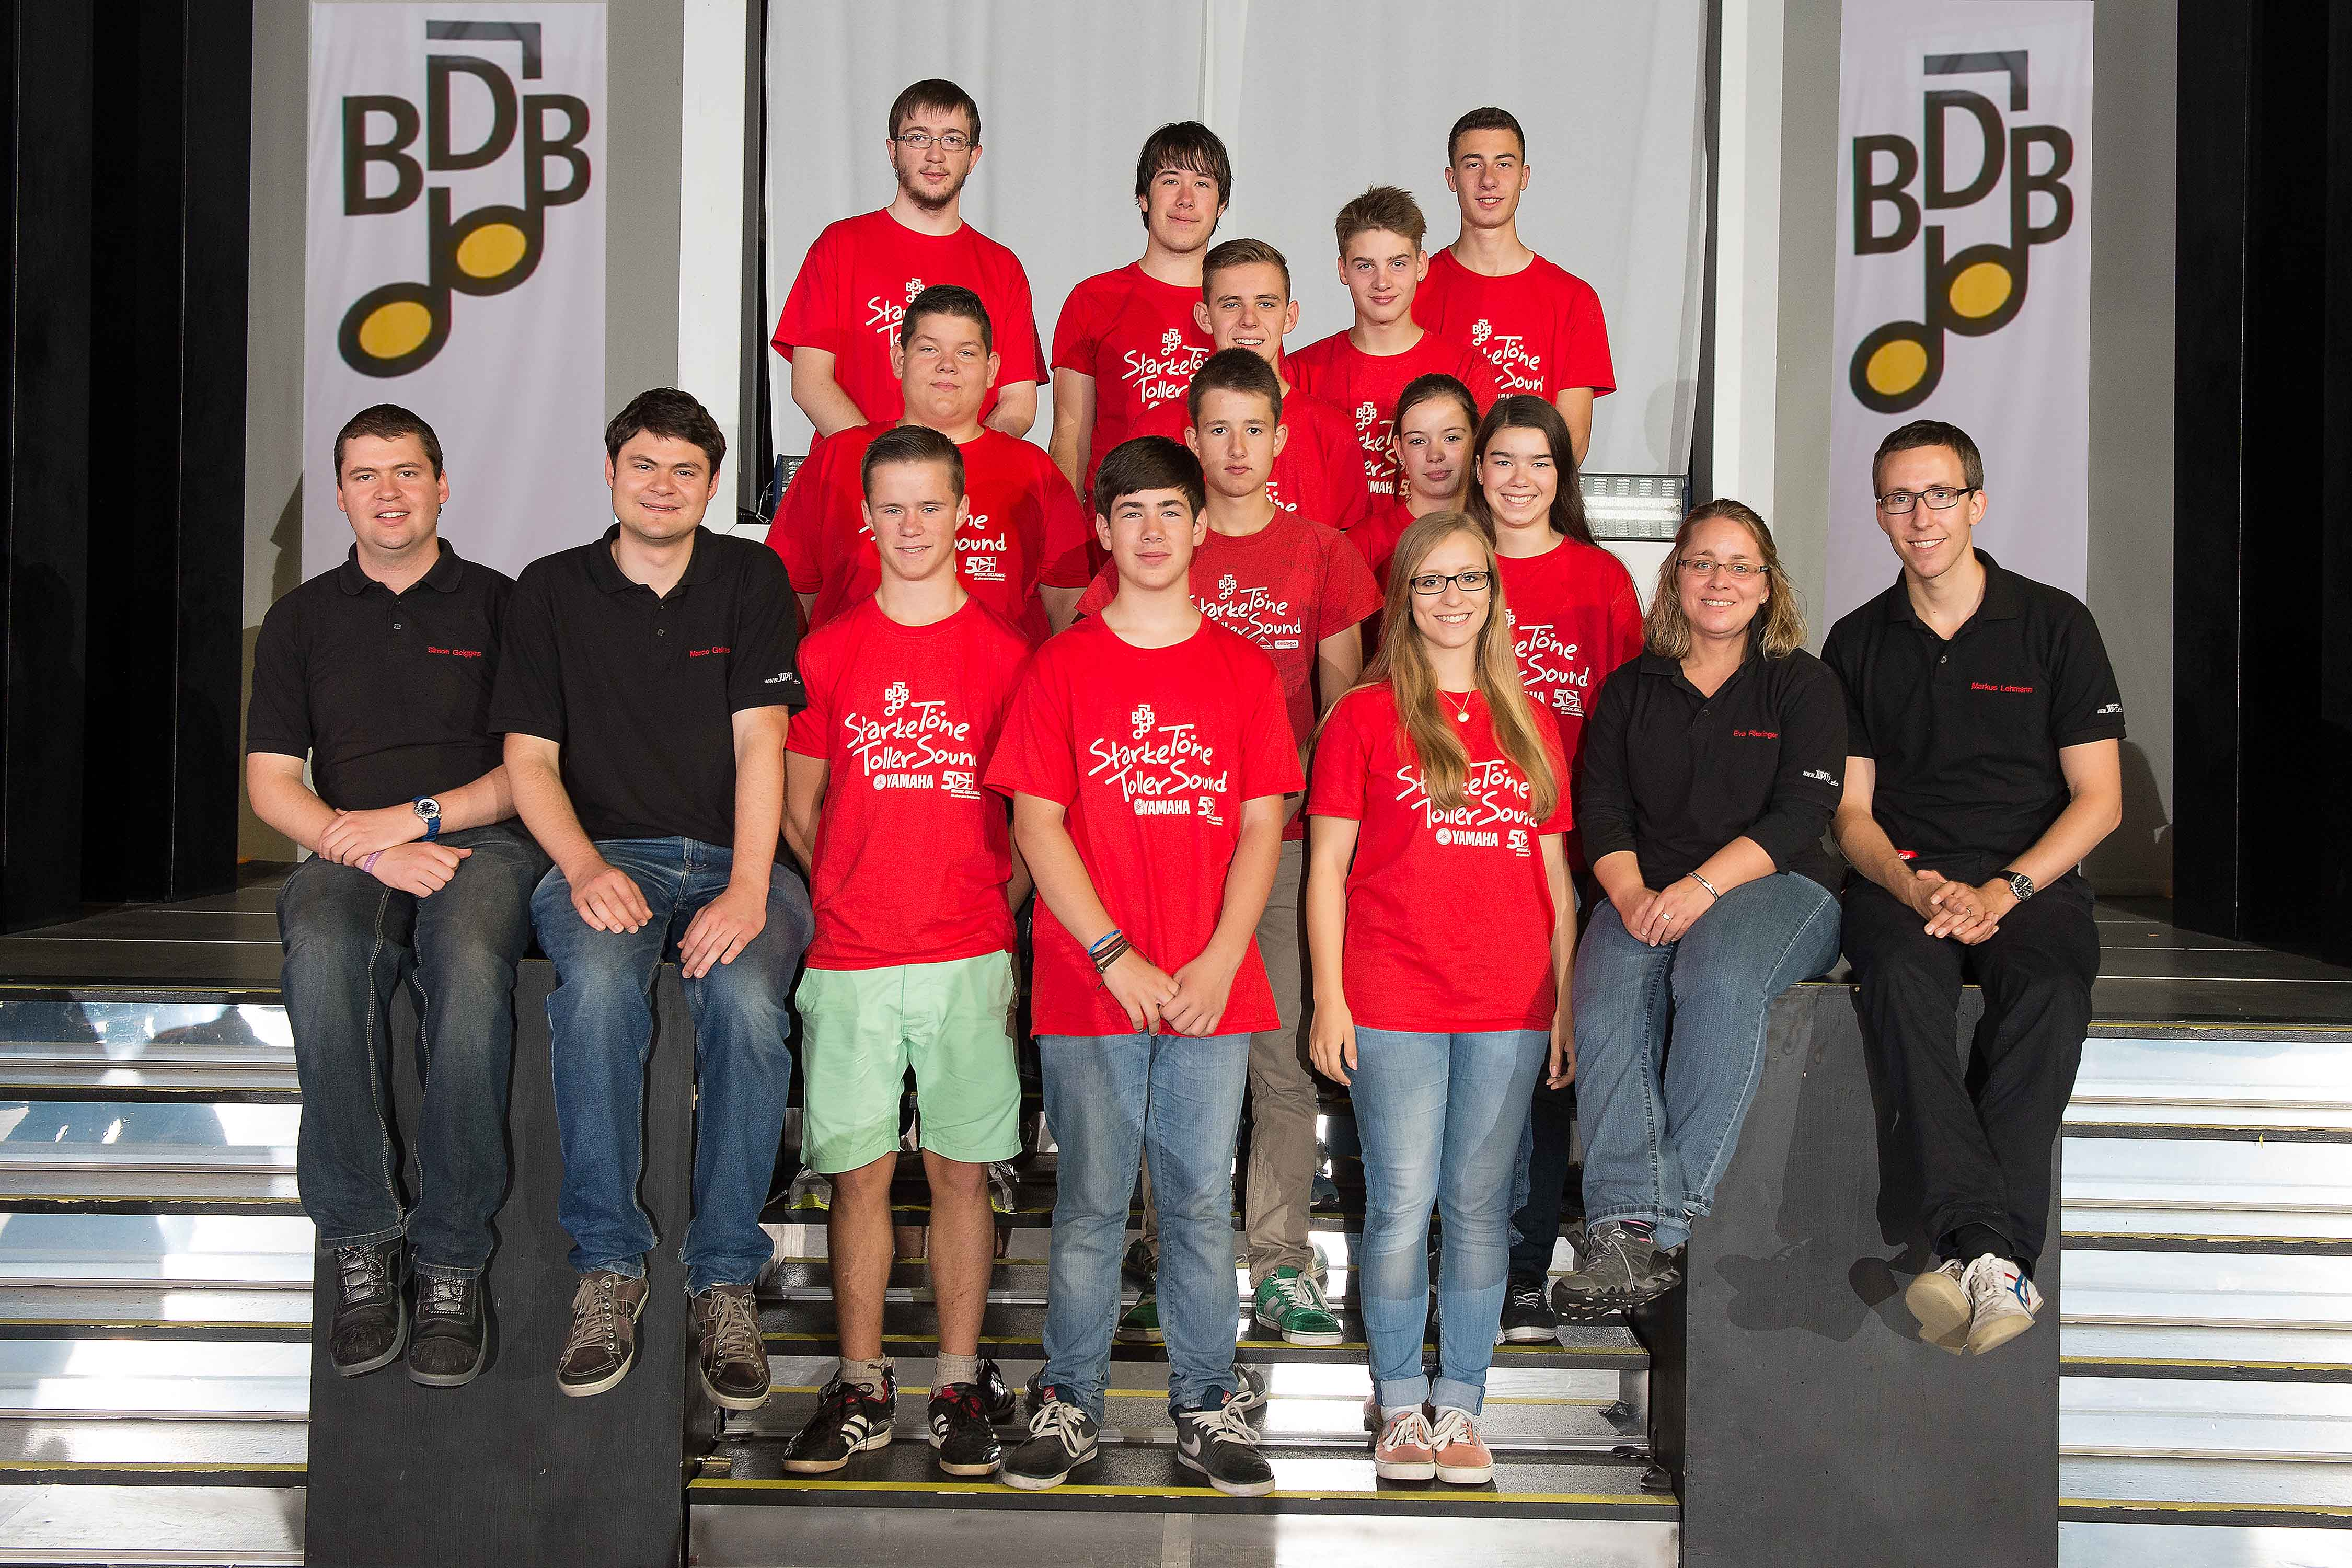 Gruppenfoto BDB-Jugendleitercamp 2014